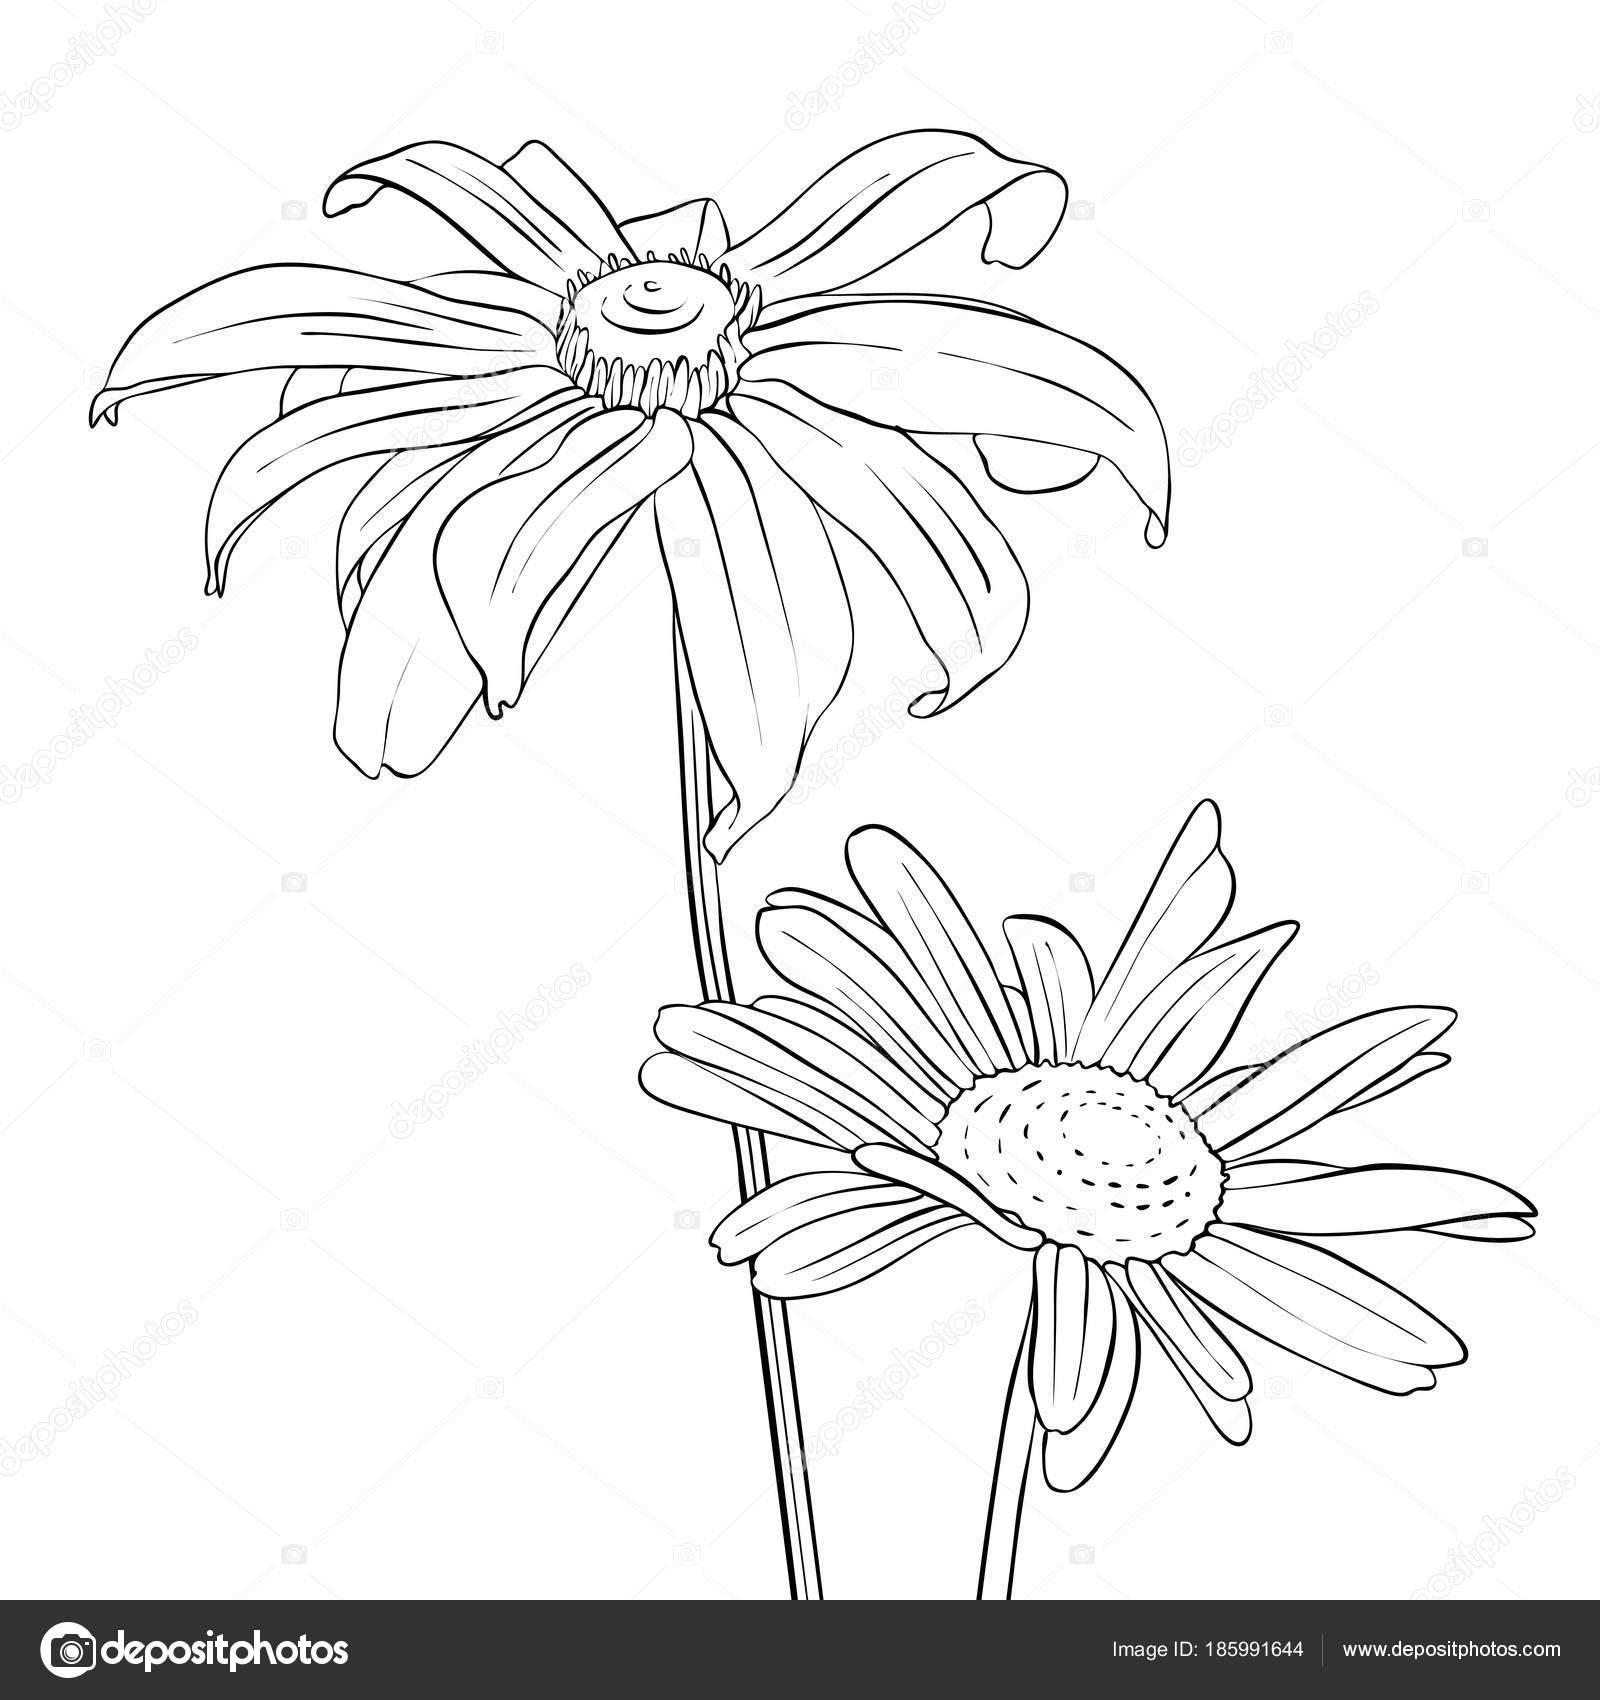 Vector drawing flowers of daisy stock vector catarchangel vector drawing flowers of daisy stock vector izmirmasajfo Choice Image